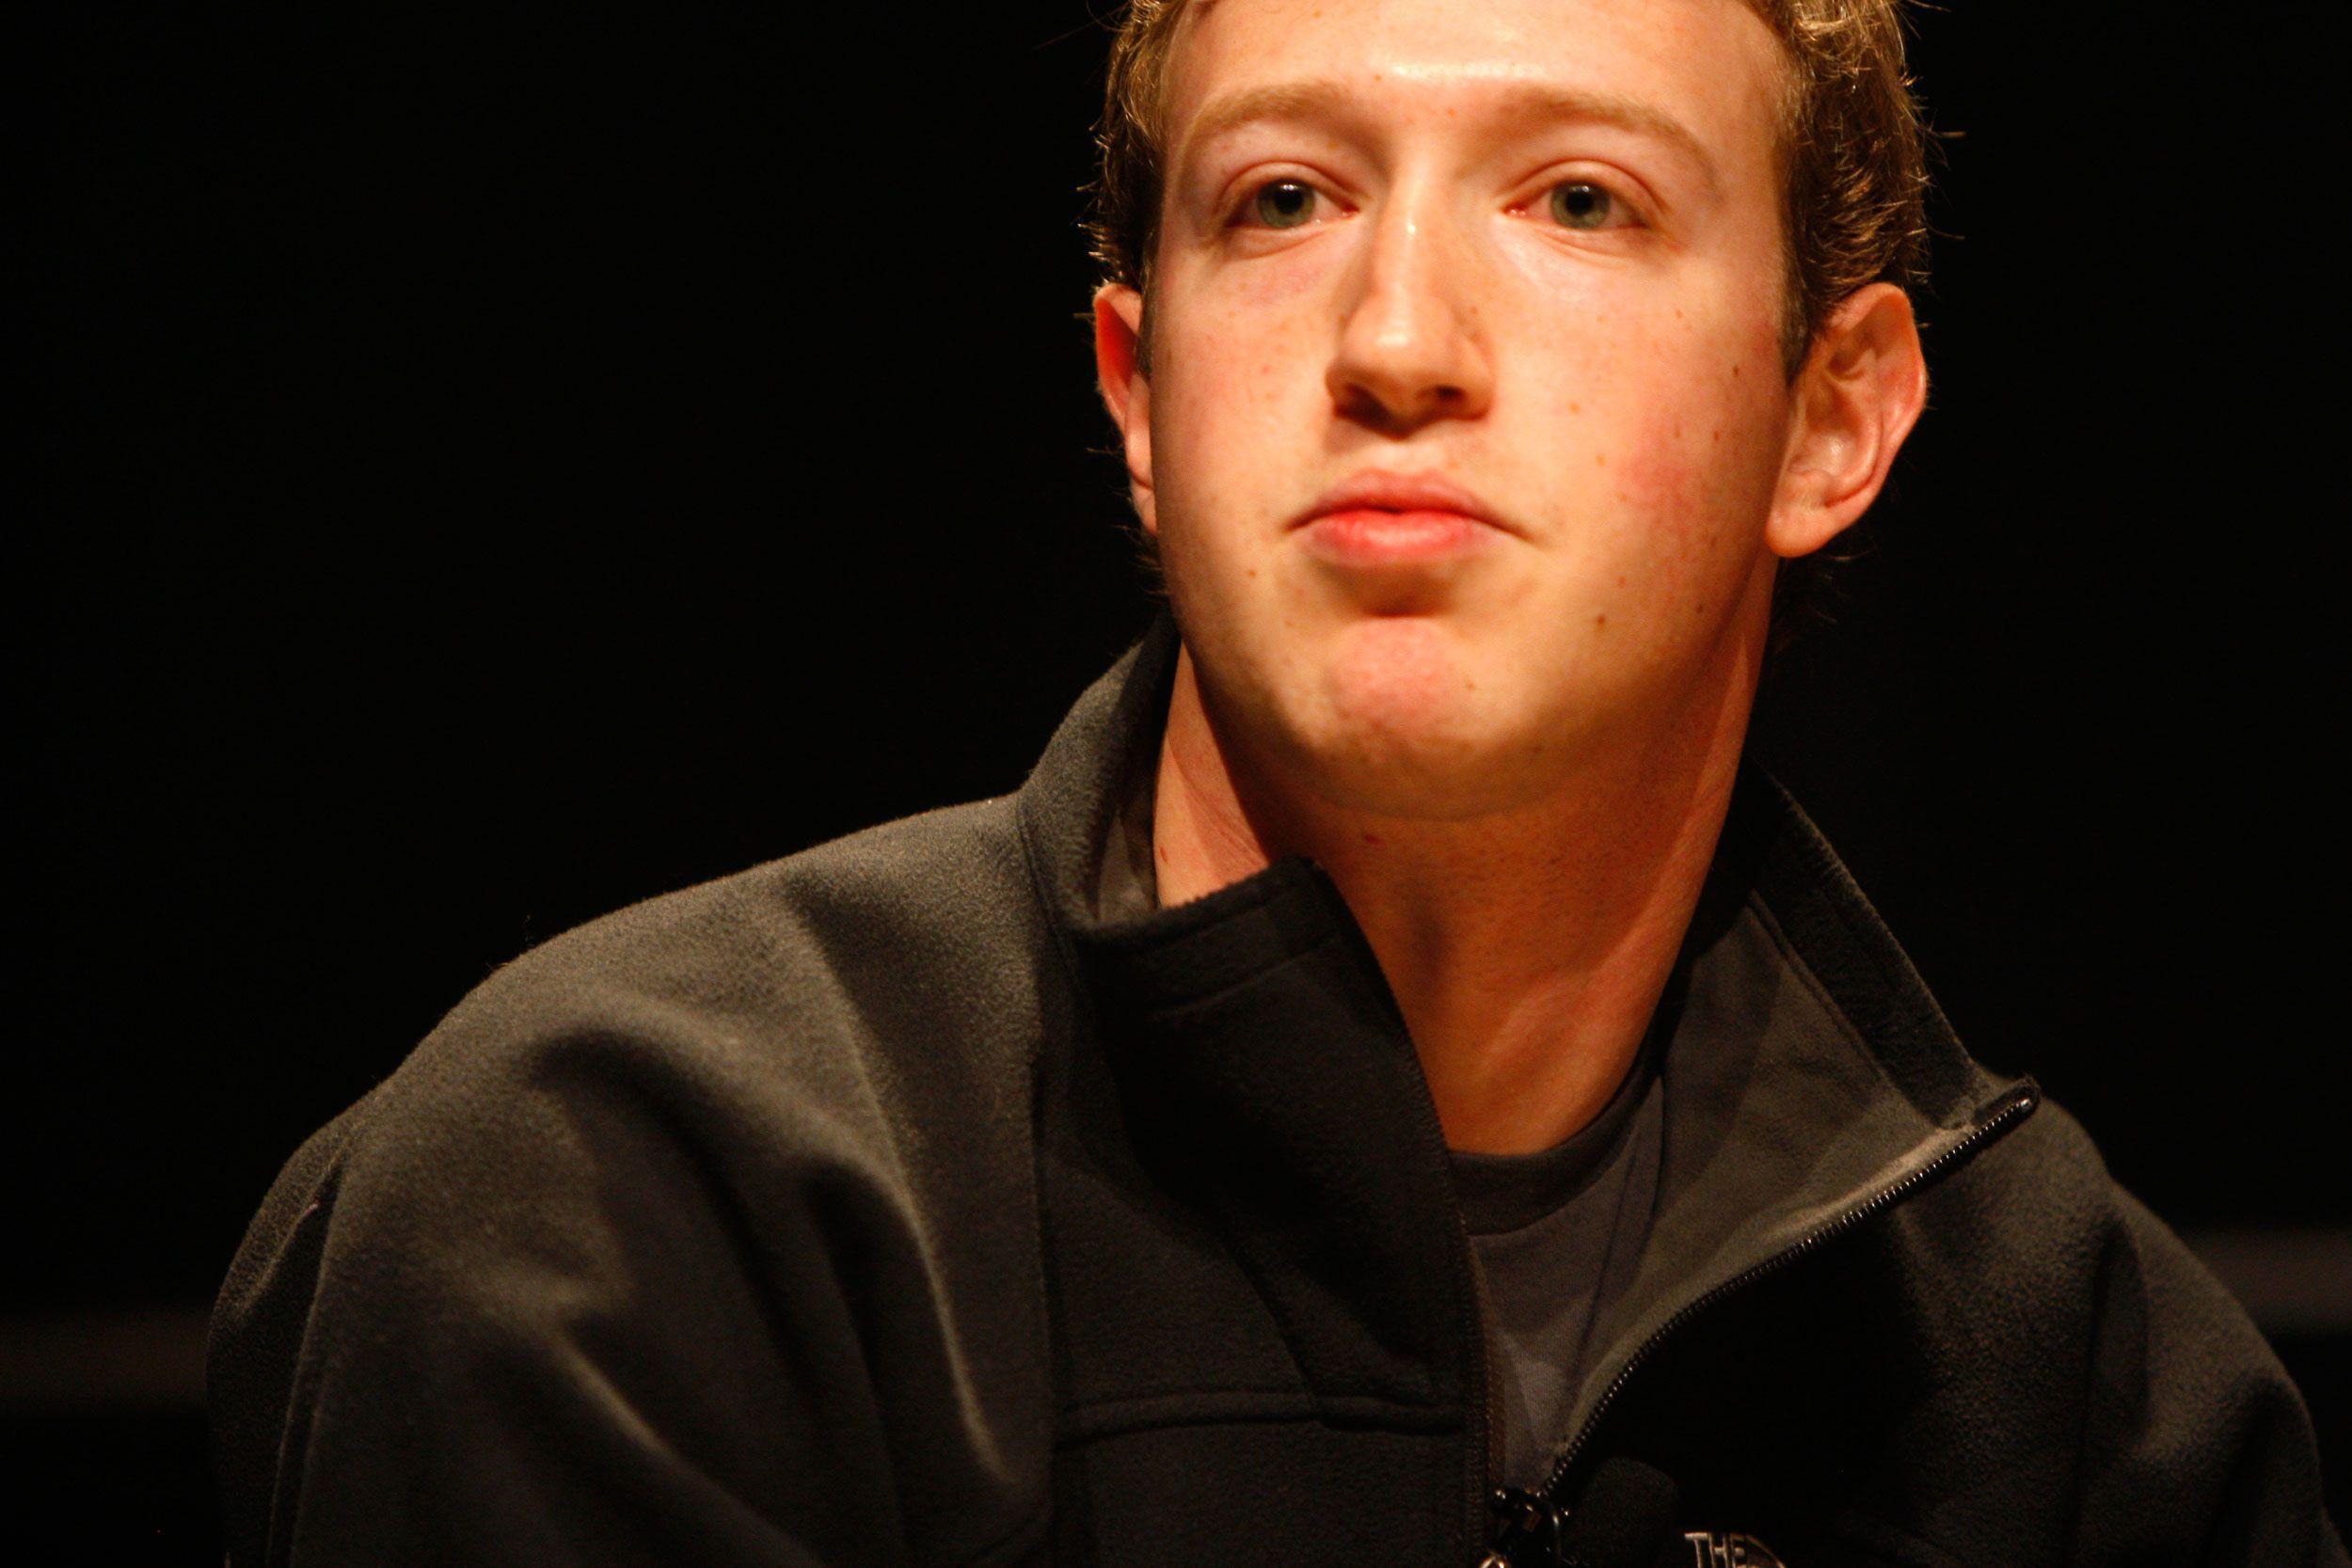 Mark Zuckerberg High Definition